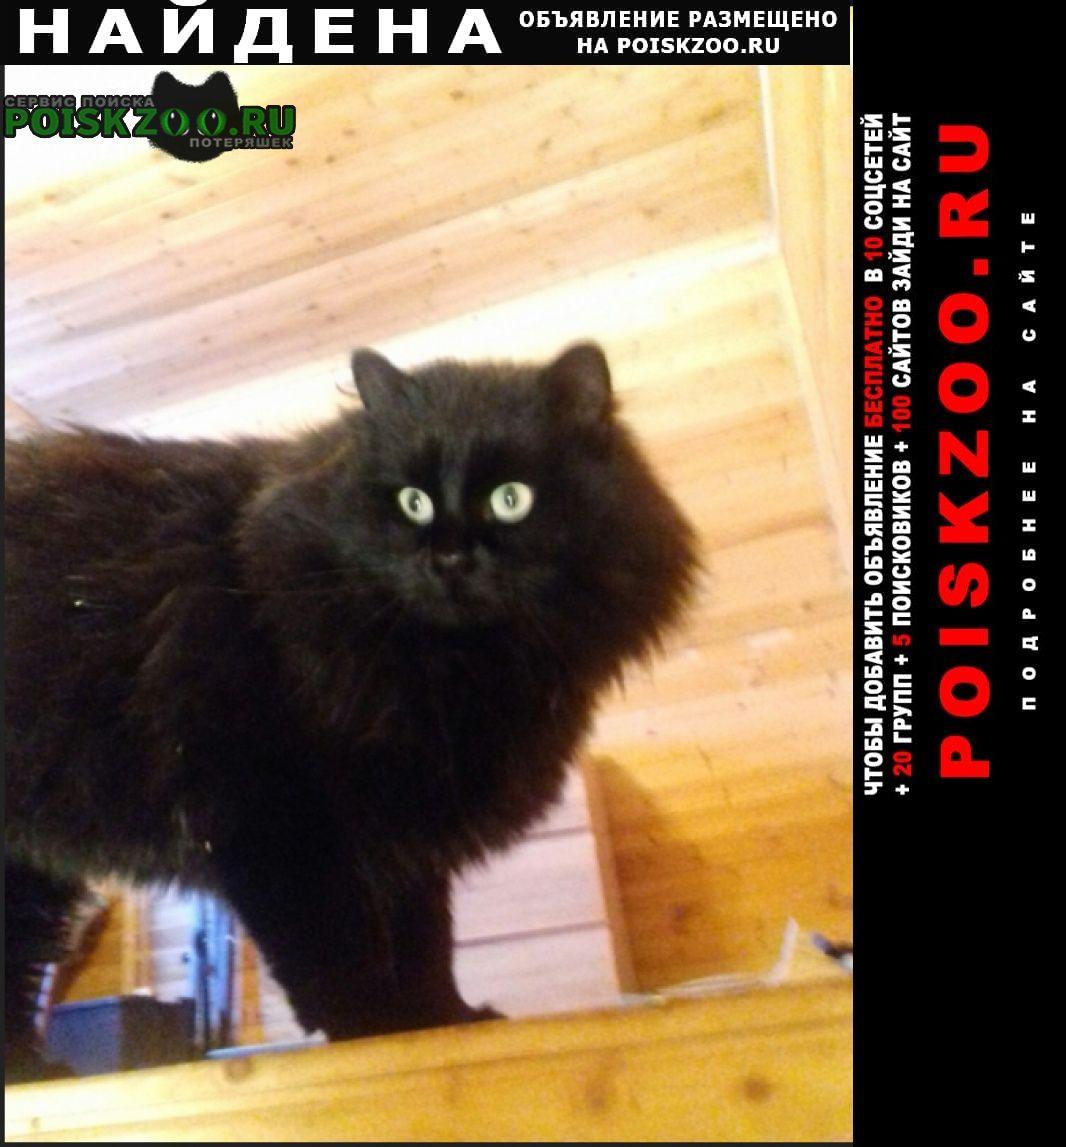 Найдена кошка кот бегемот ищет хозяев Тула